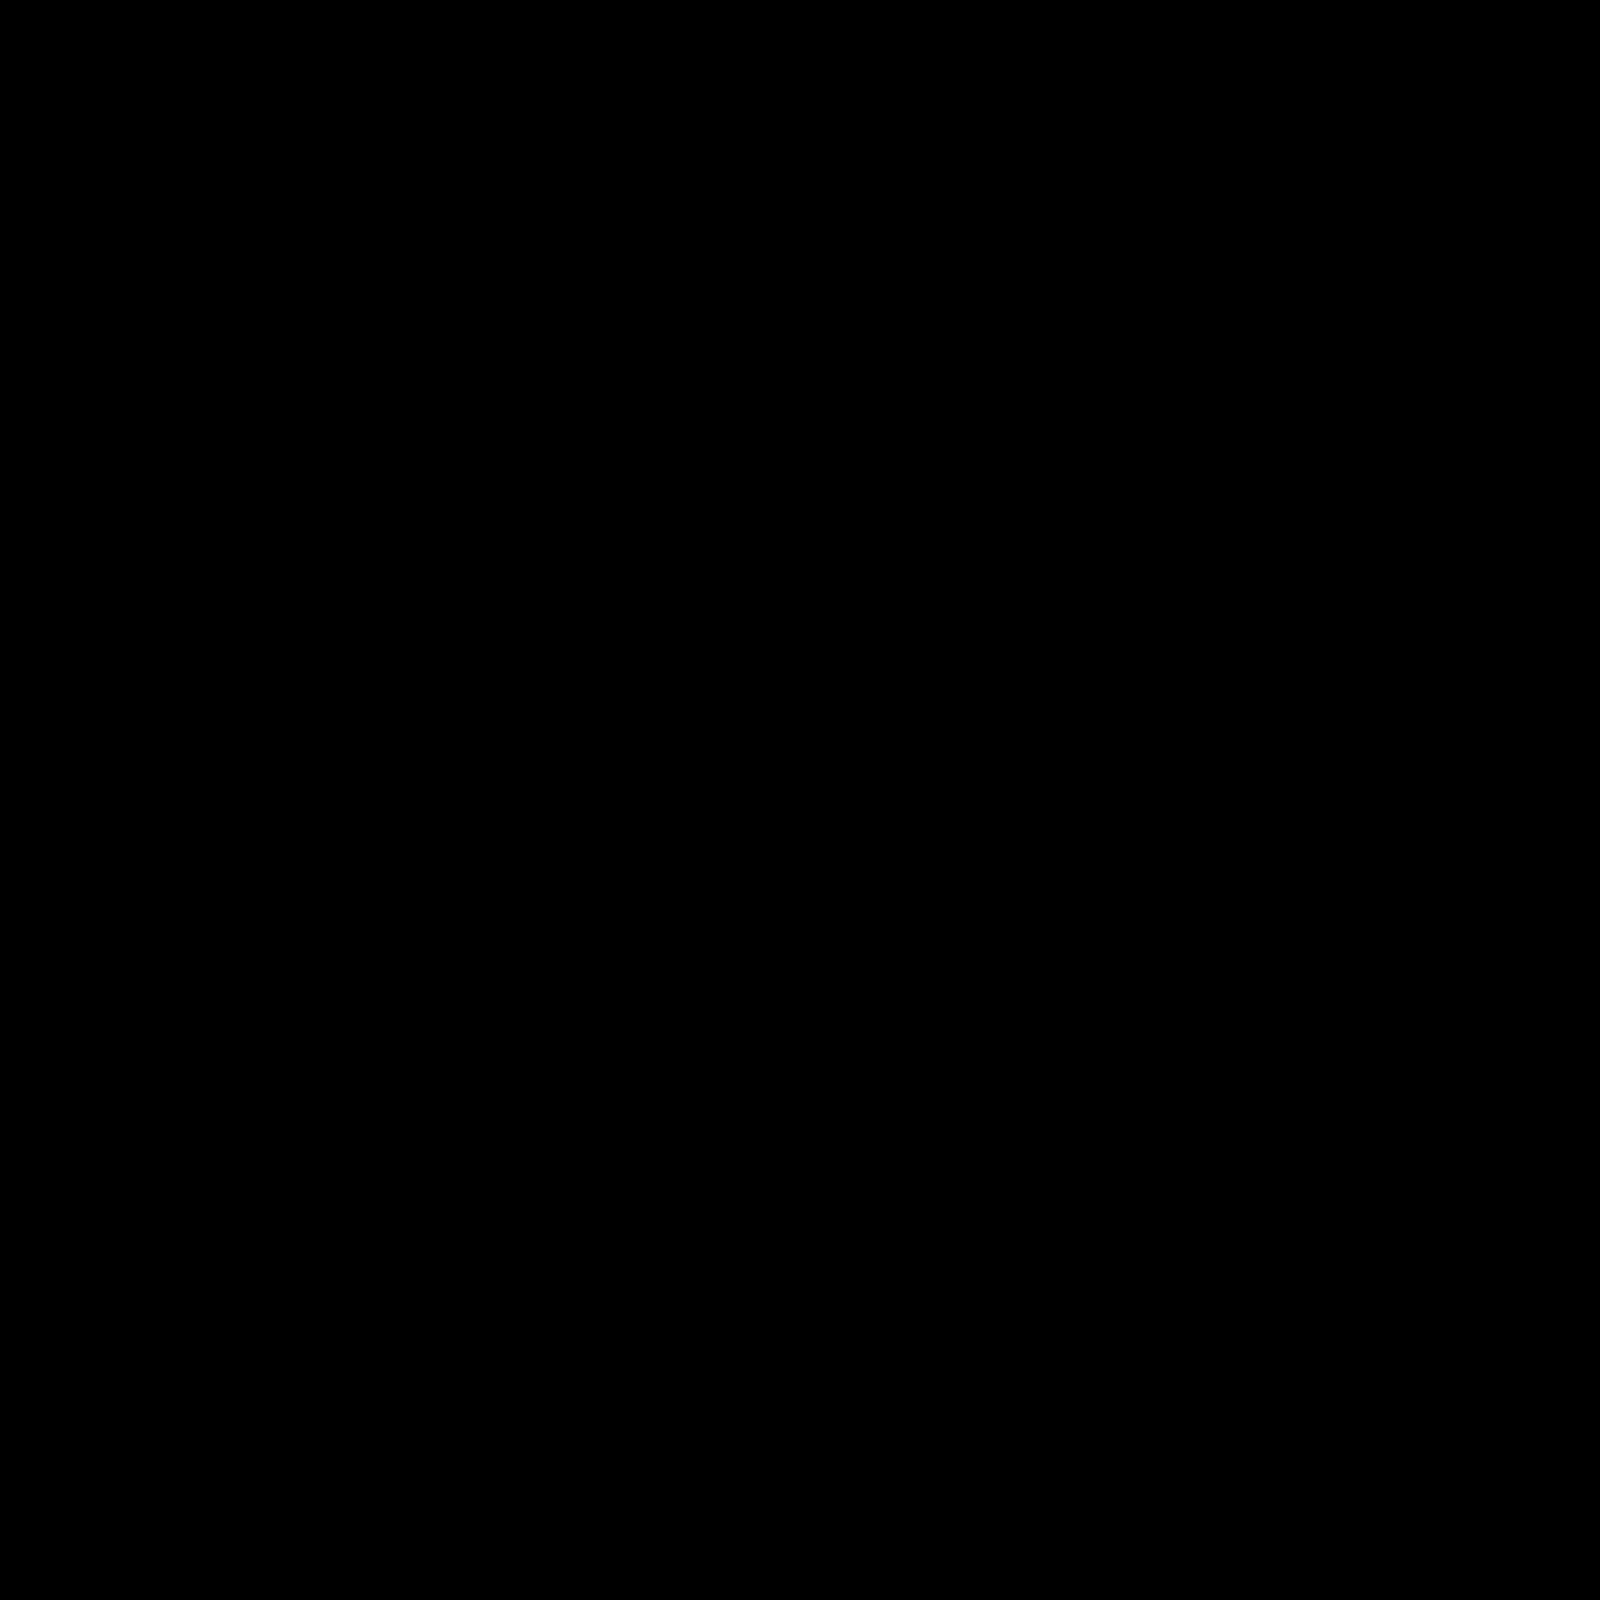 Naval Mine icon